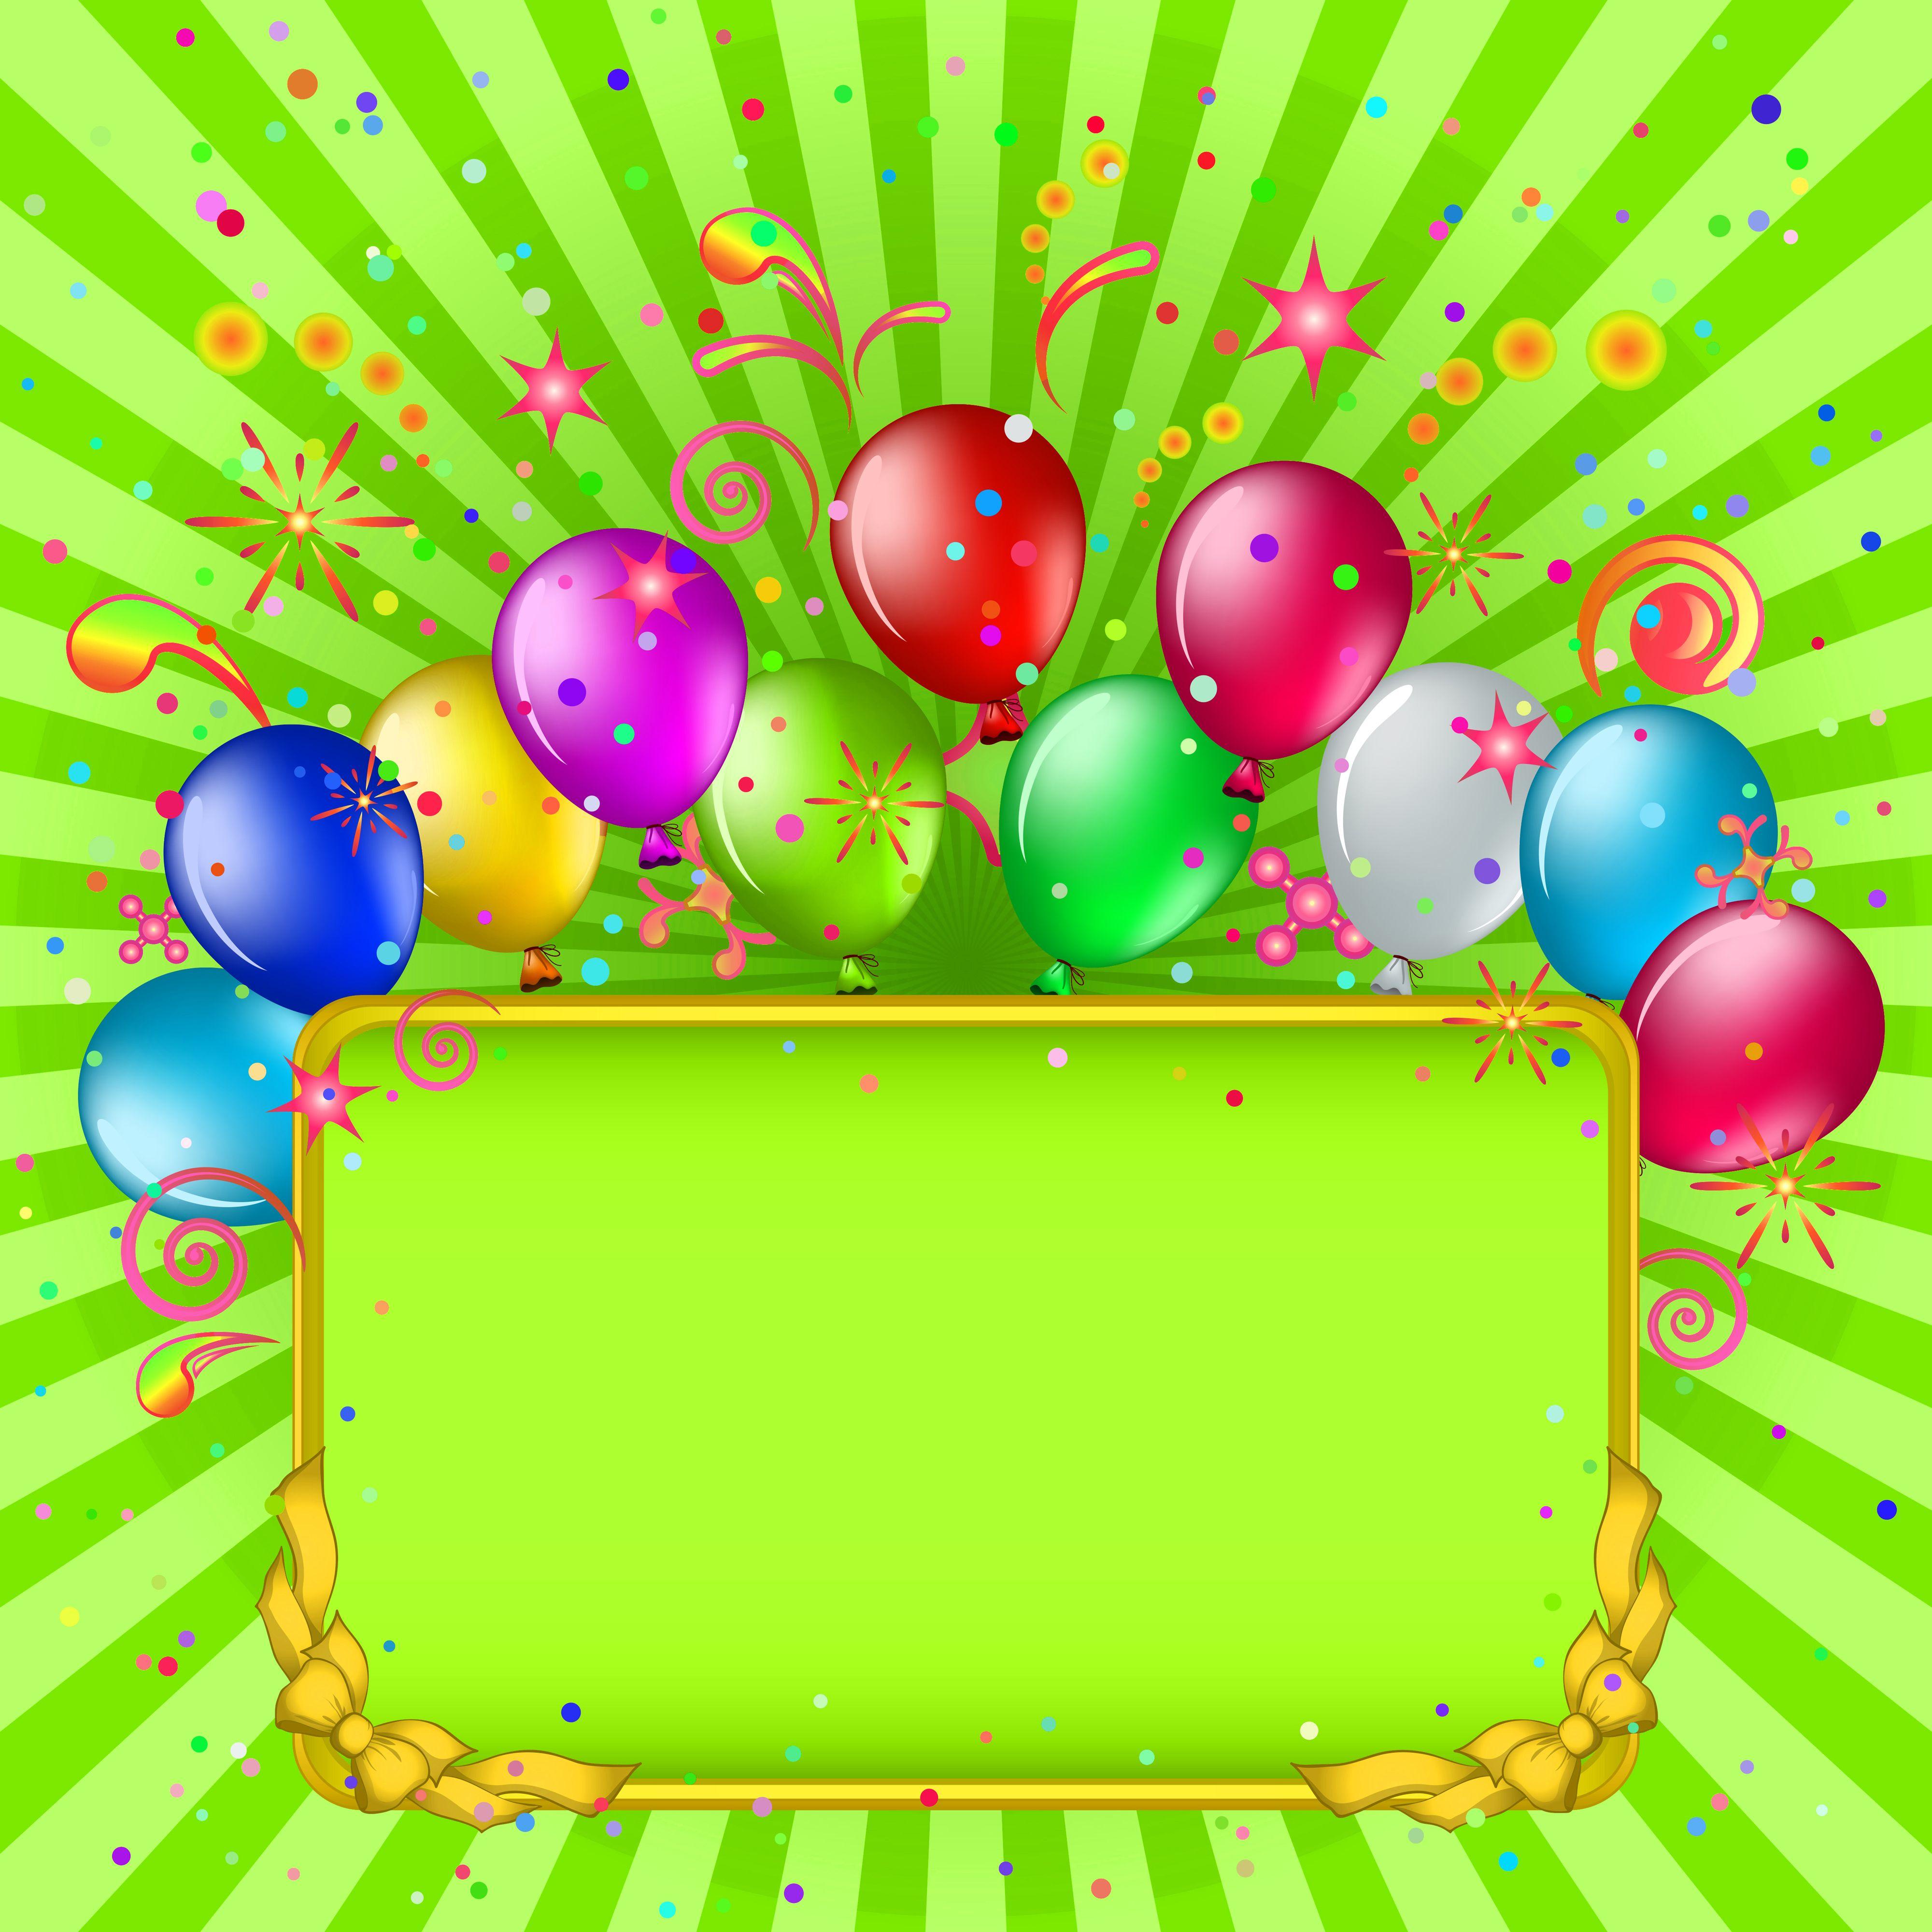 Green Birthday Background With Balloons Birthday Banner Design